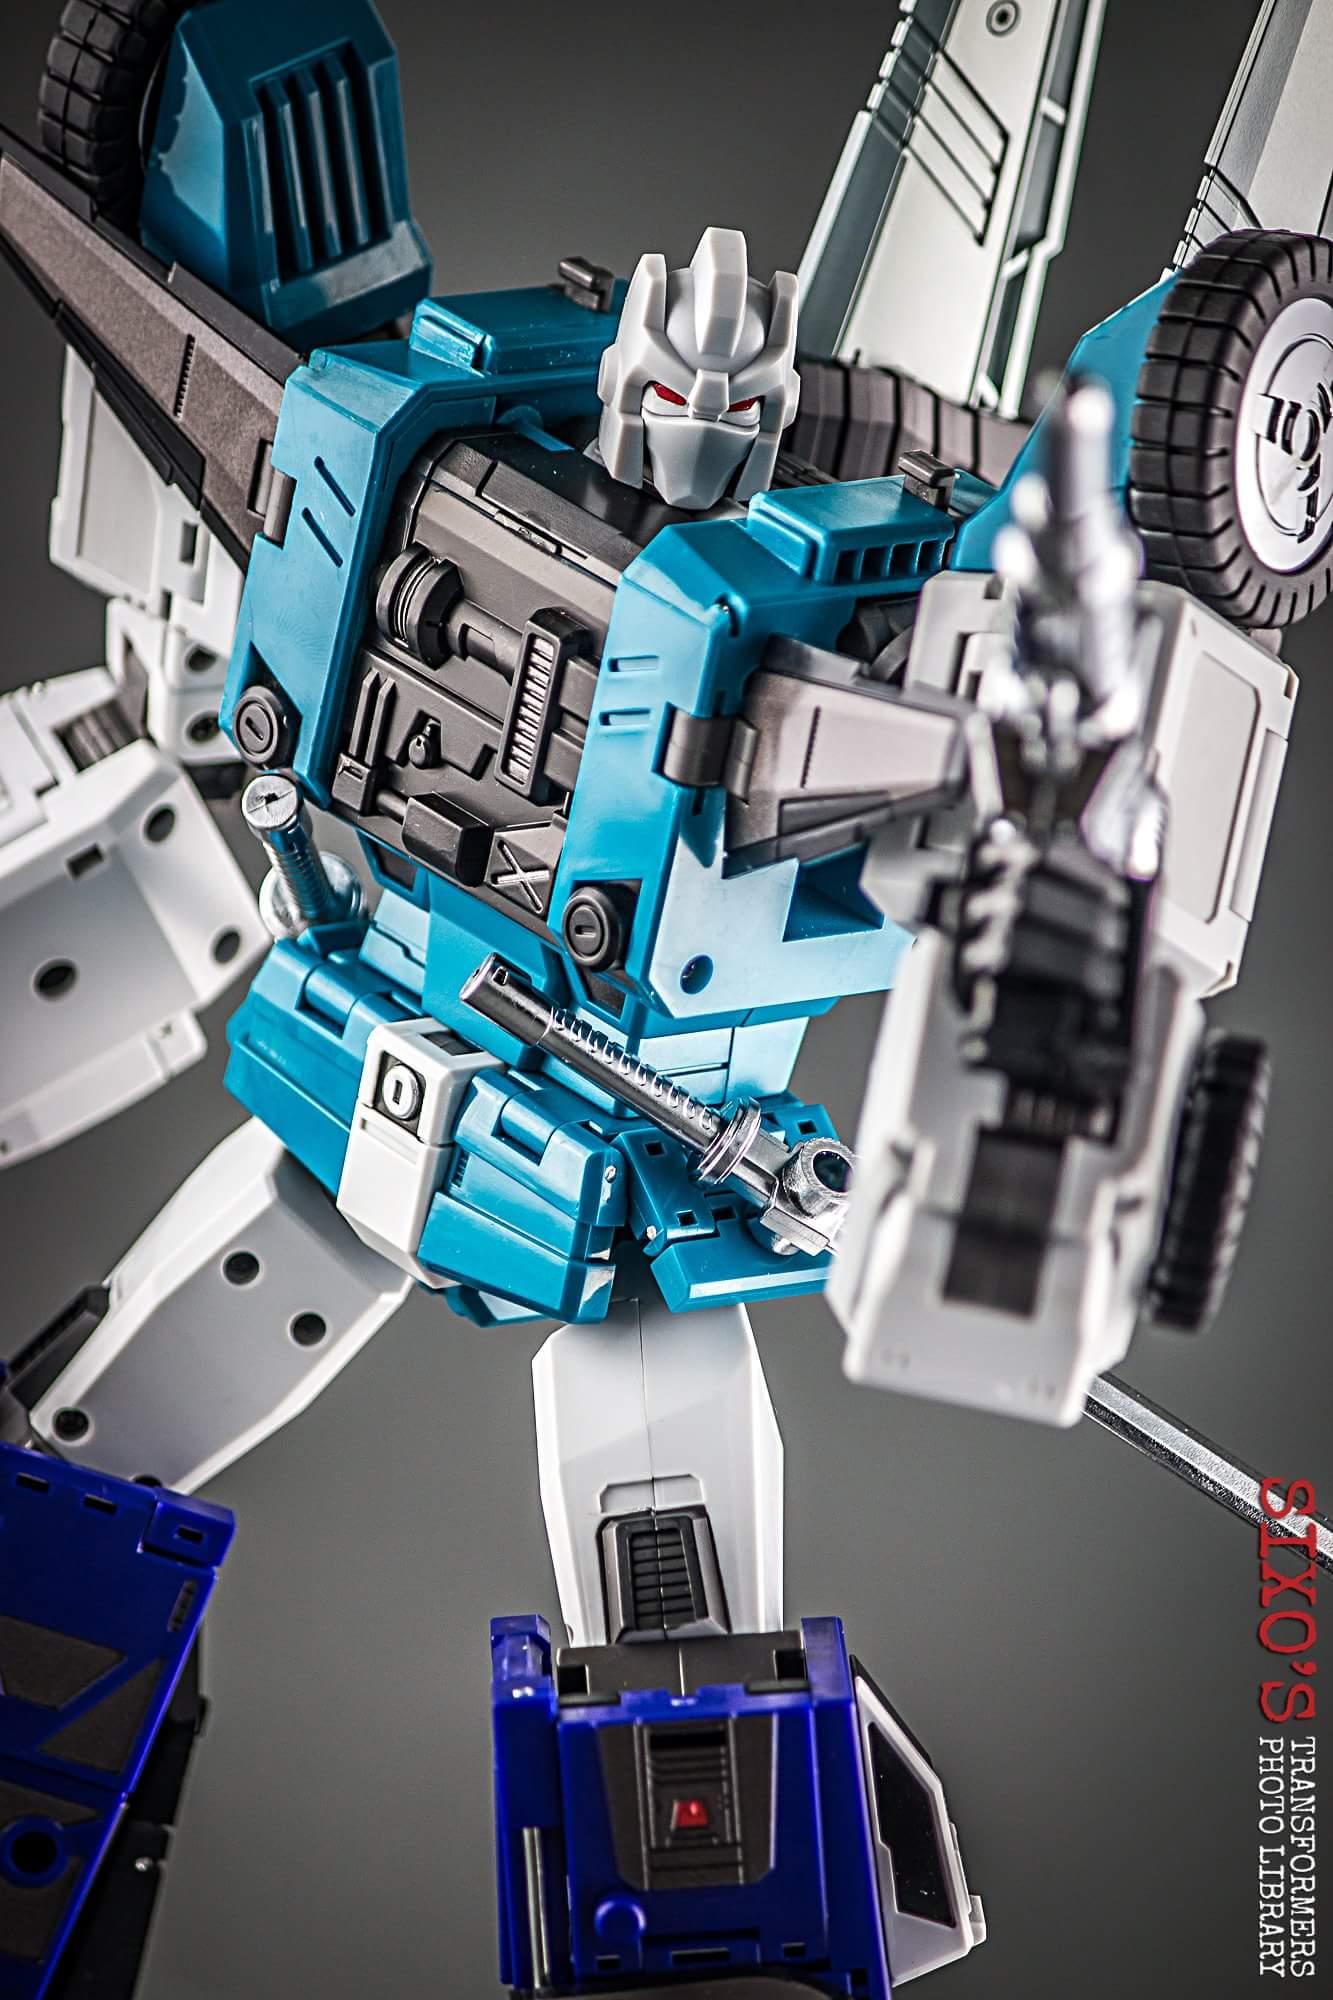 [DX9 Toys] Produit Tiers - Jouet D10 Hanzo - aka Sixshot/Hexabot - Page 2 1b0zUsMR